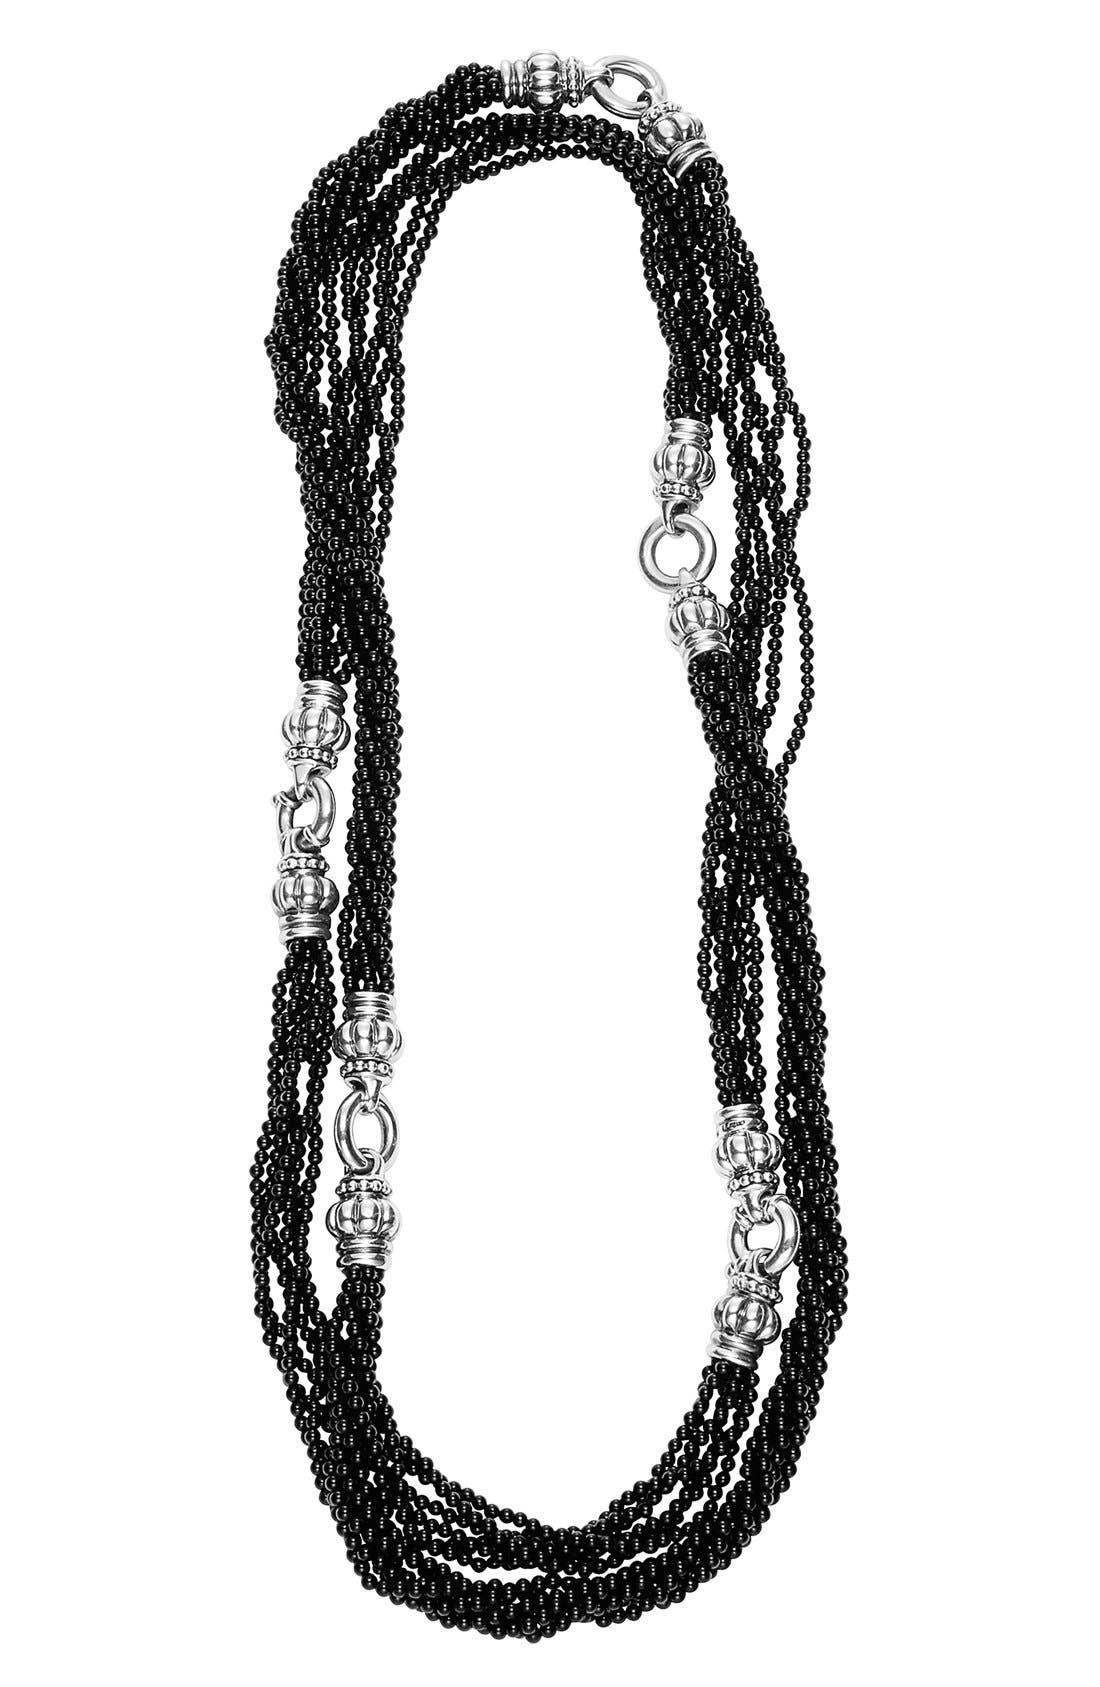 LAGOS Black Caviar Beaded Necklace